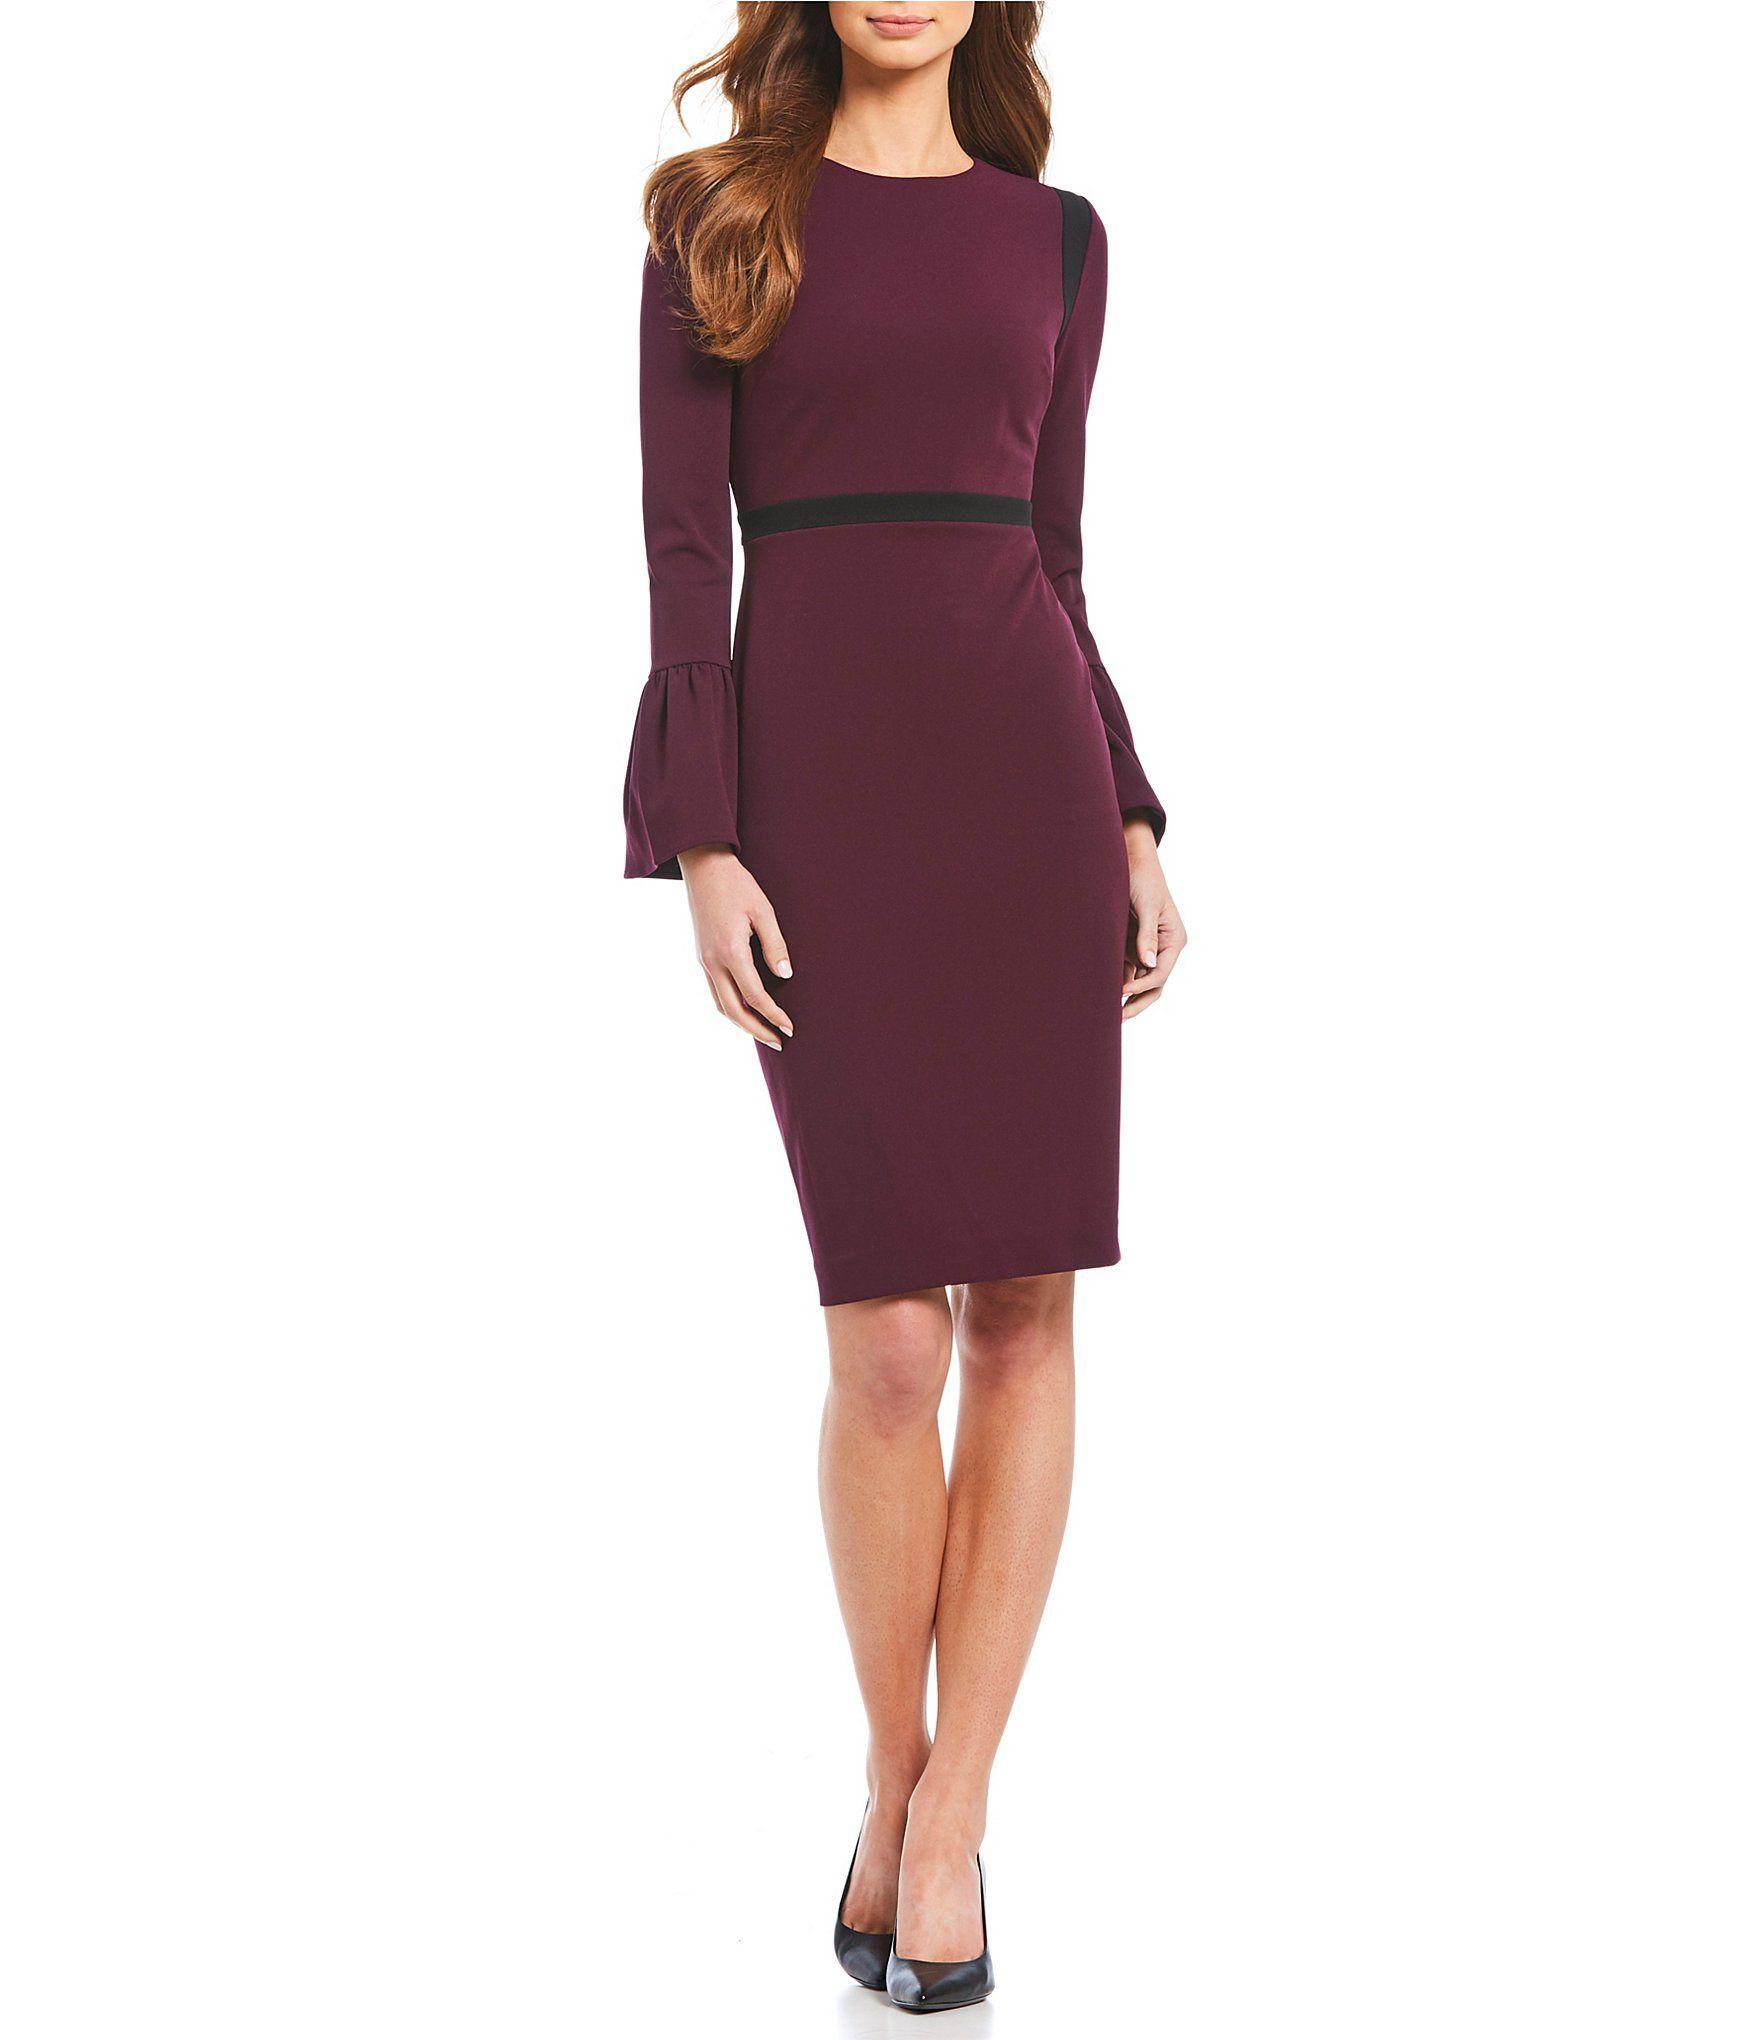 3ed946a13ff Shop for Calvin Klein Bell Sleeve Sheath Dress at Dillards.com. Visit  Dillards.com to find clothing